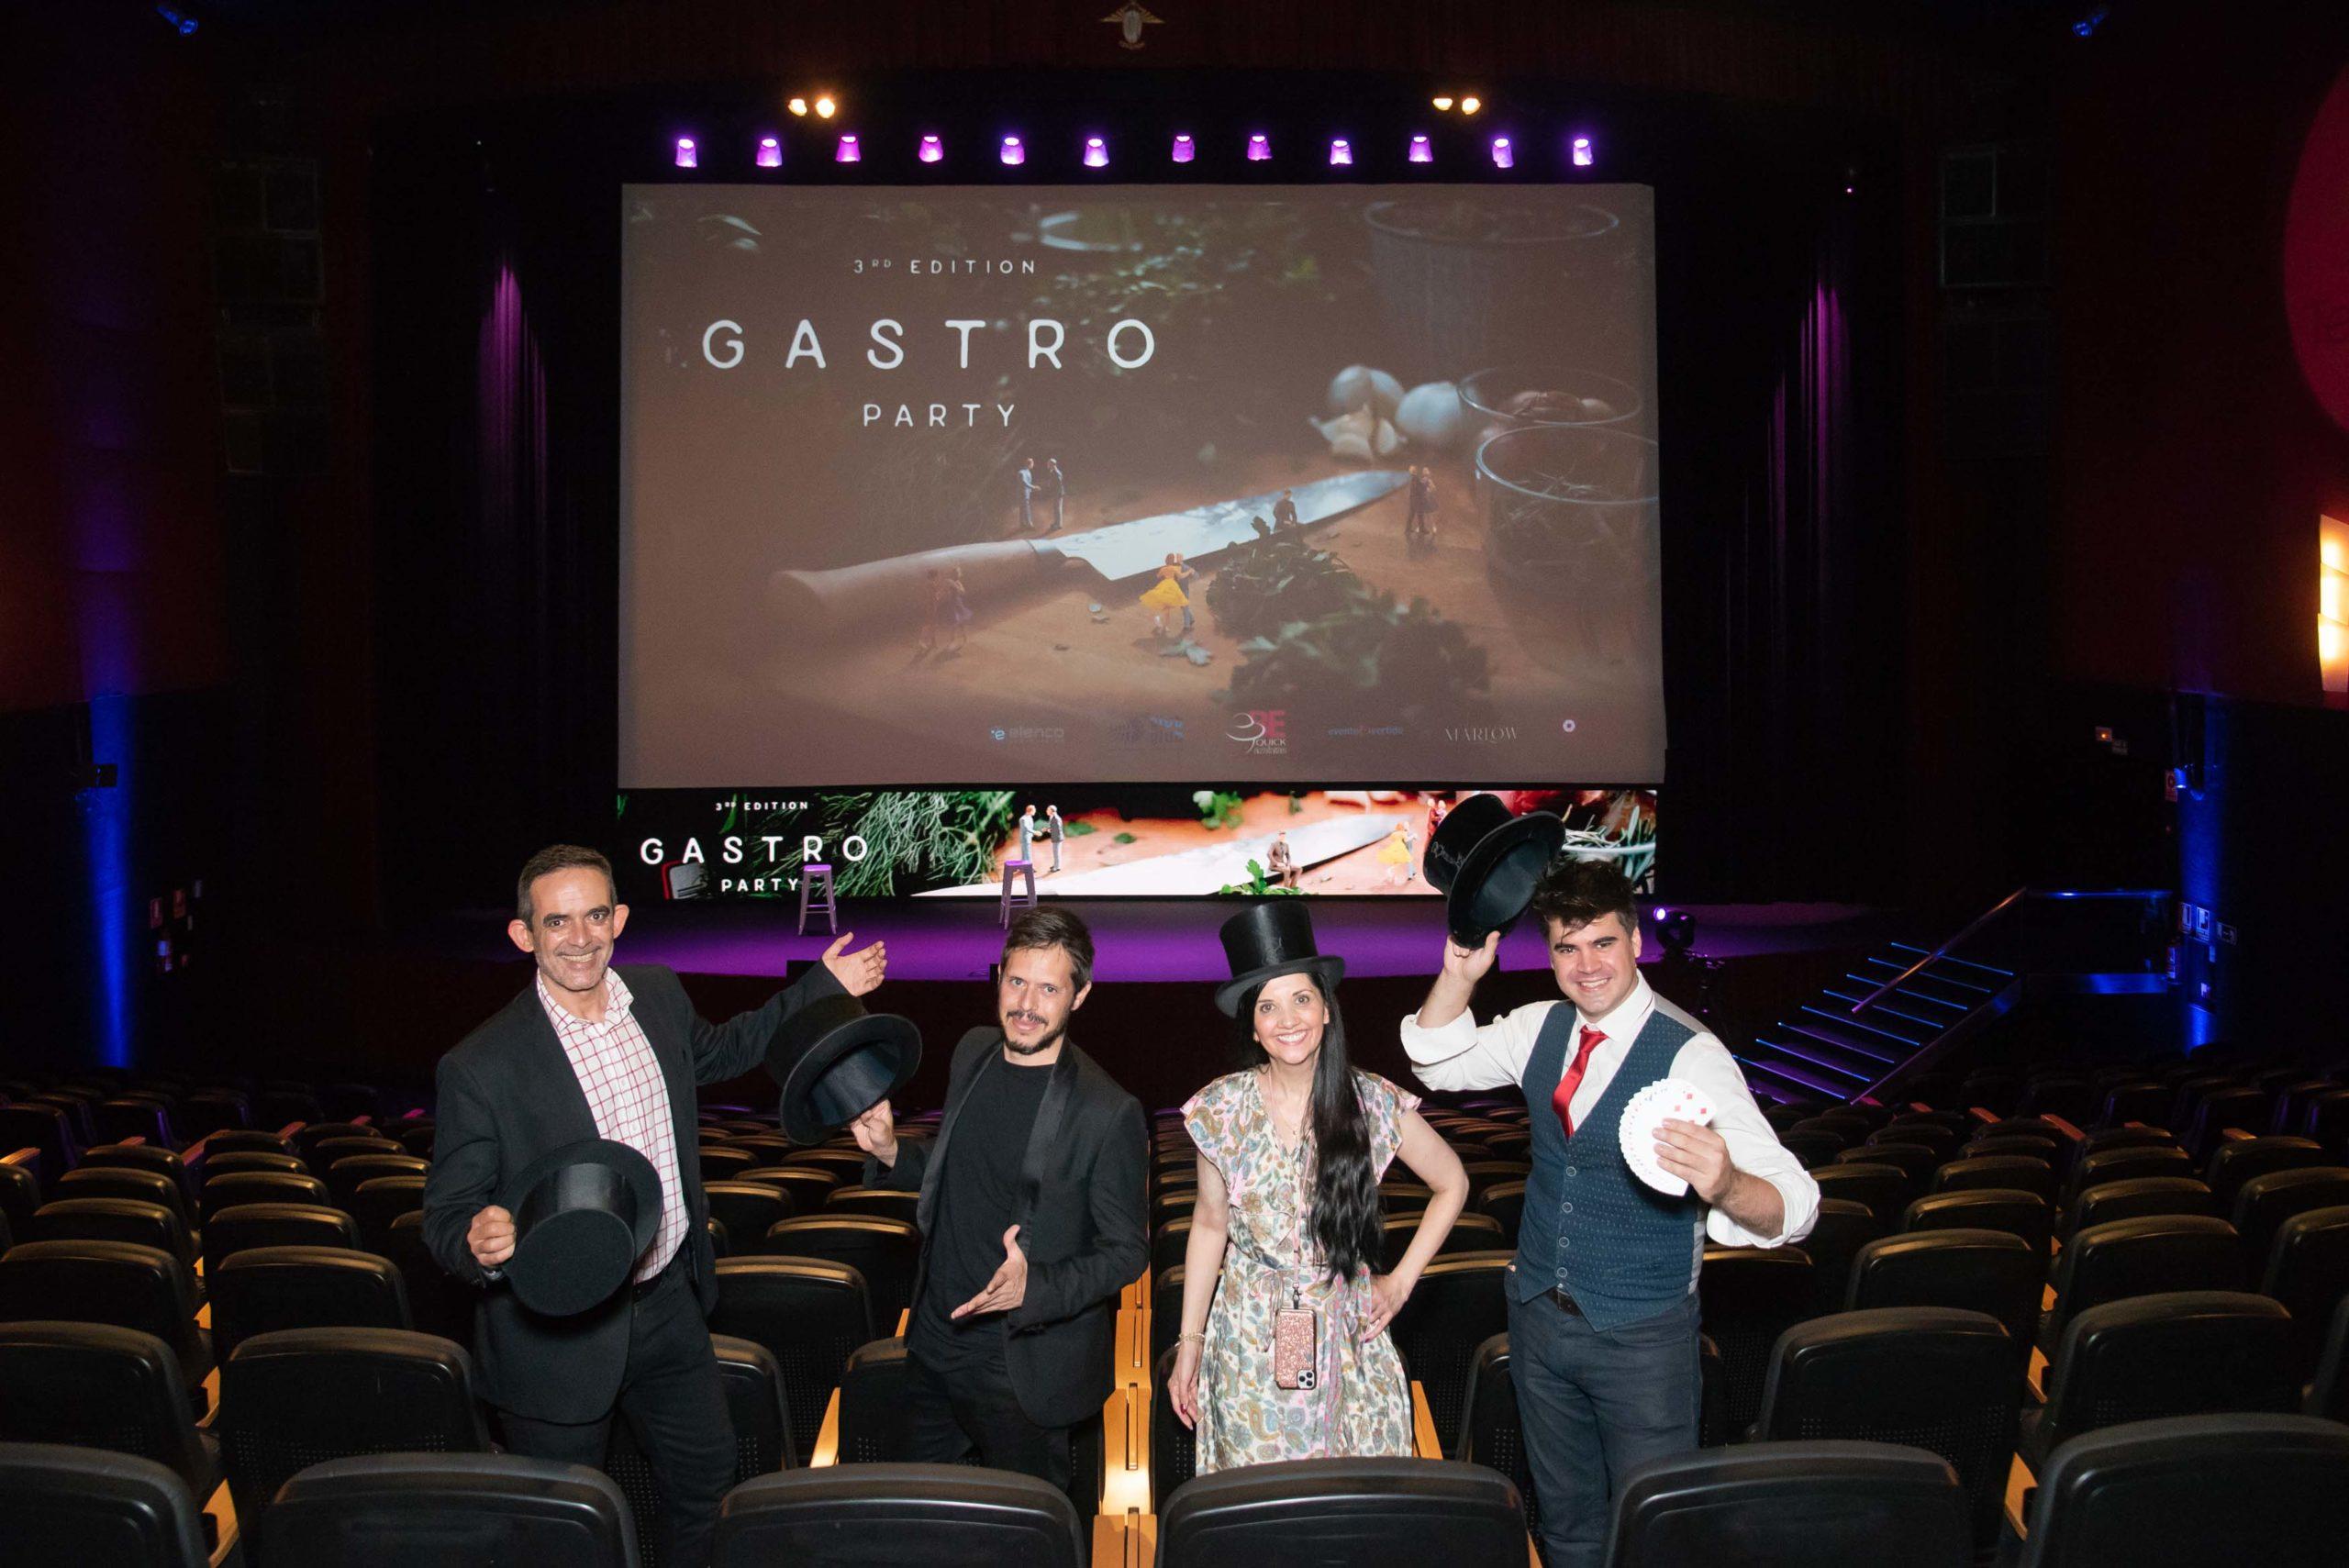 02-TeatroGoya-GastroParty-Asistentes-033